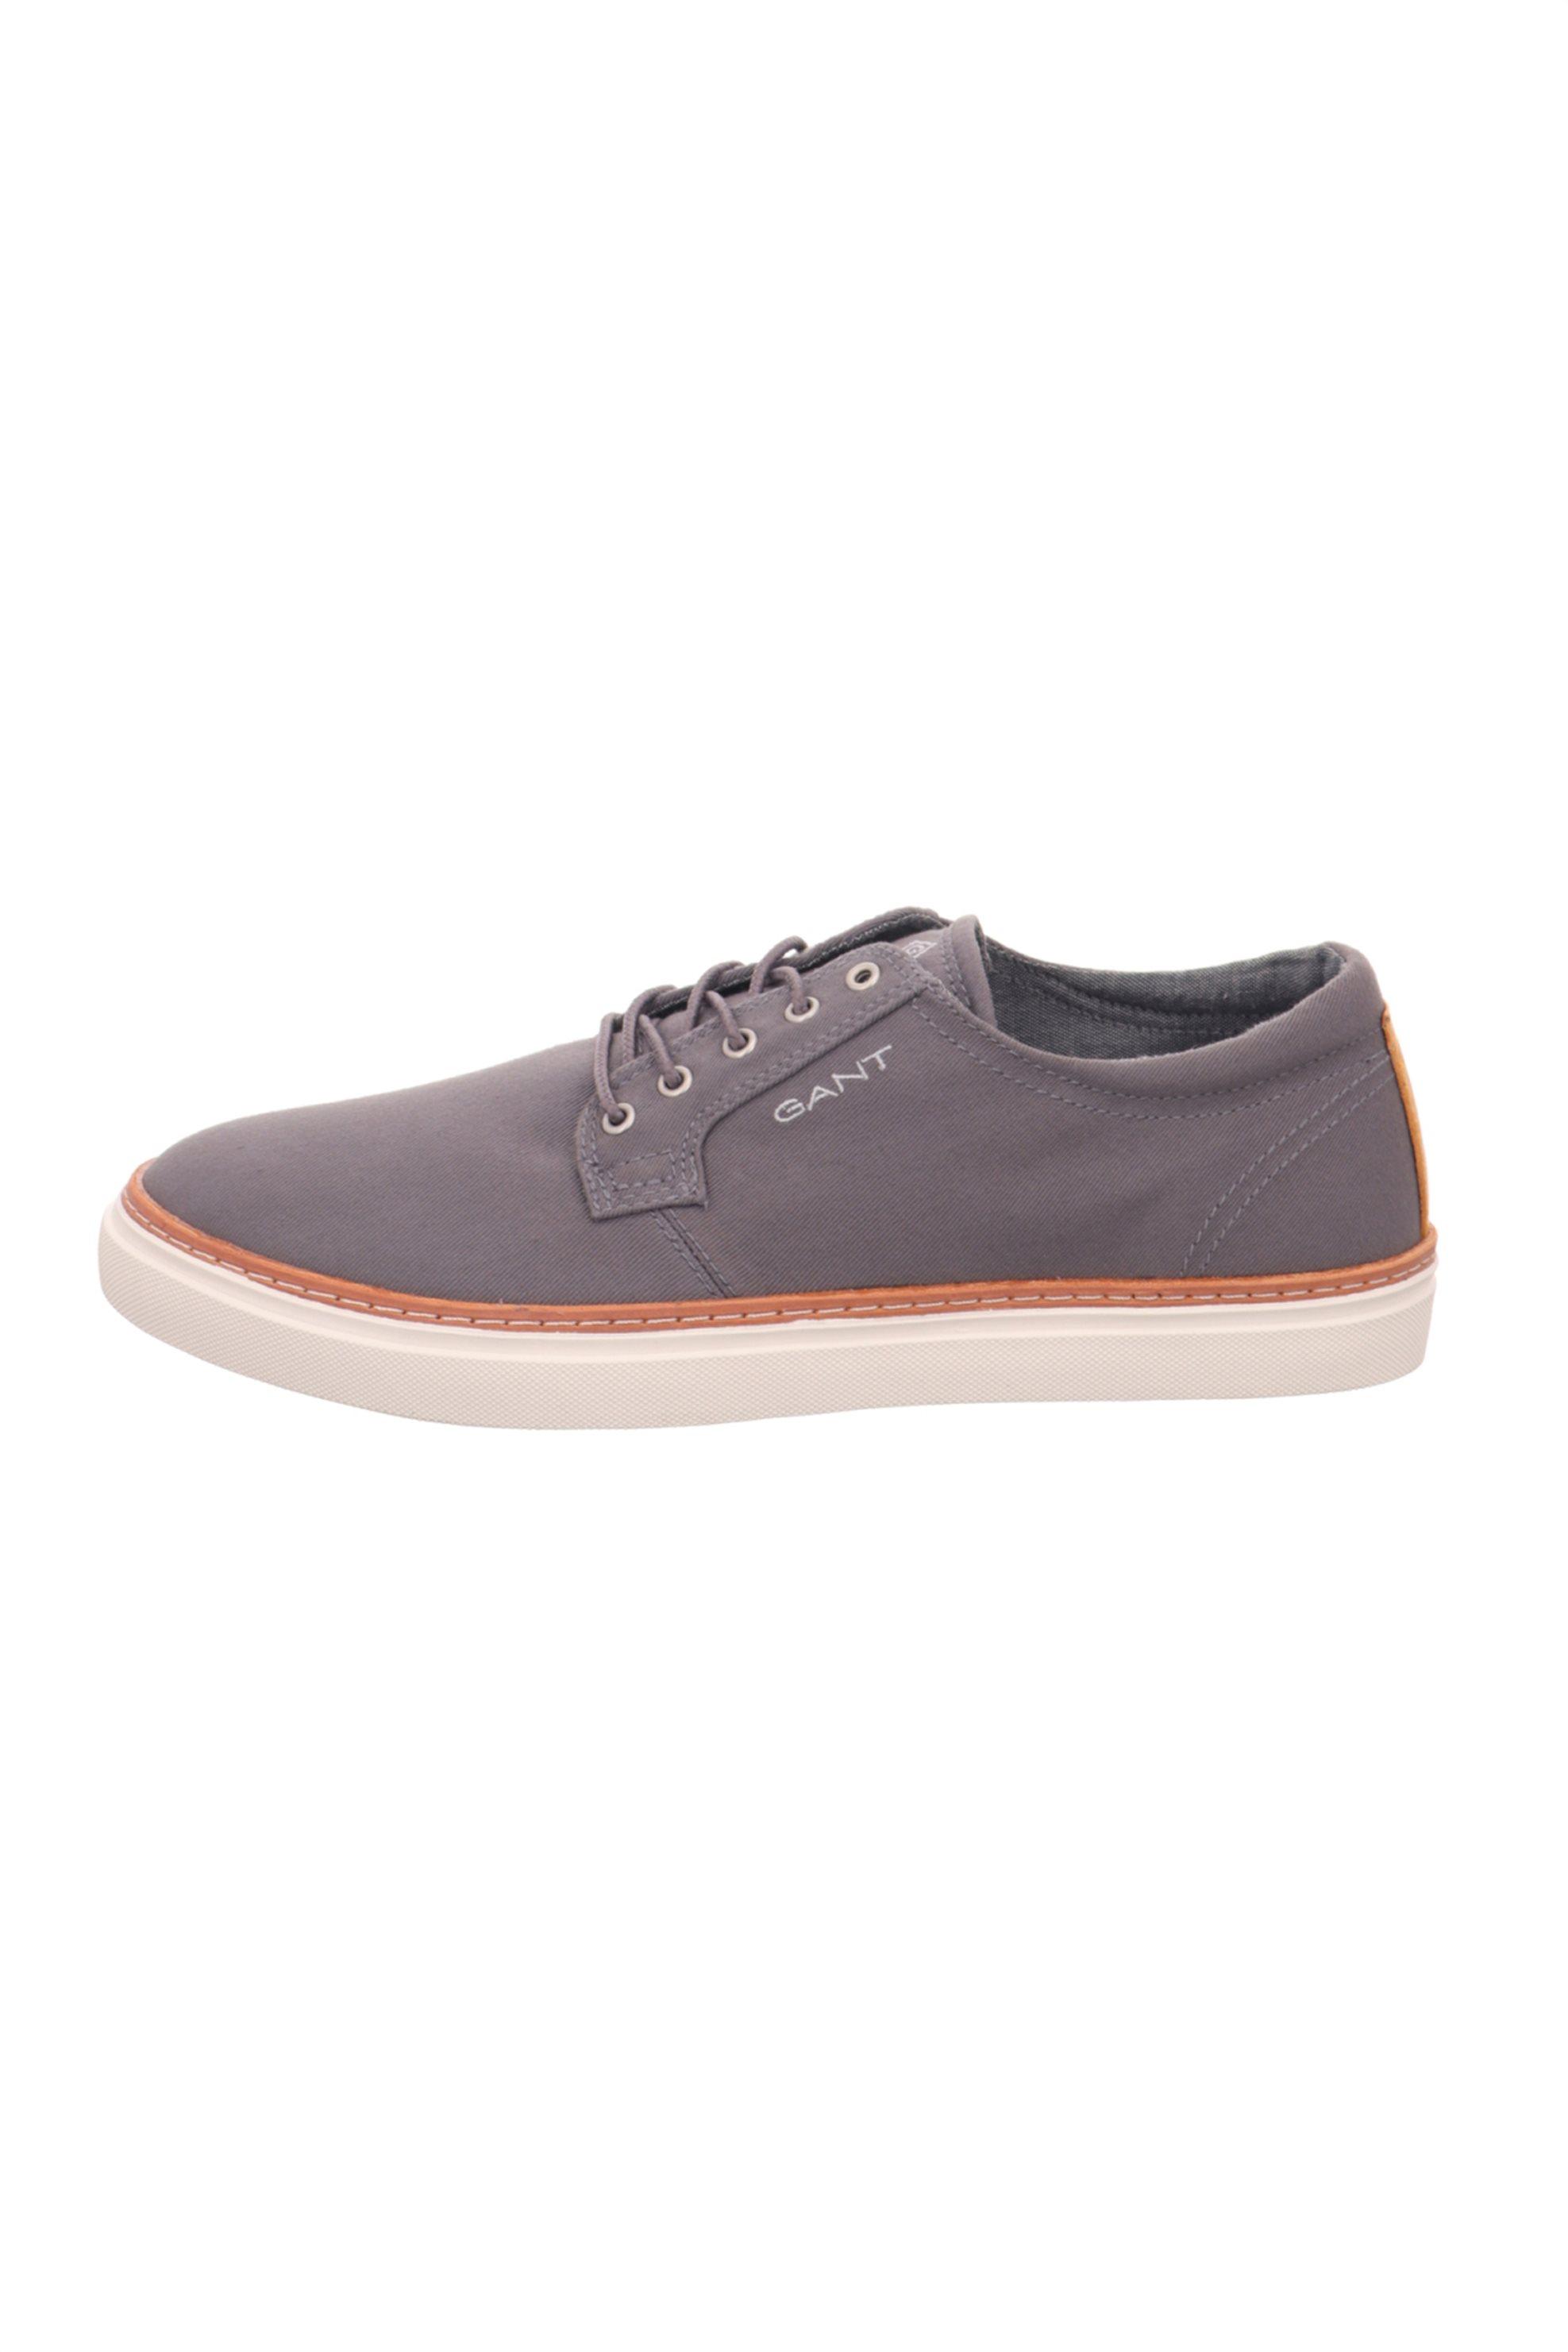 "Gant ανδρικά sneakers με κορδόνια ""Prepville"" – 20638496 – Ανθρακί"